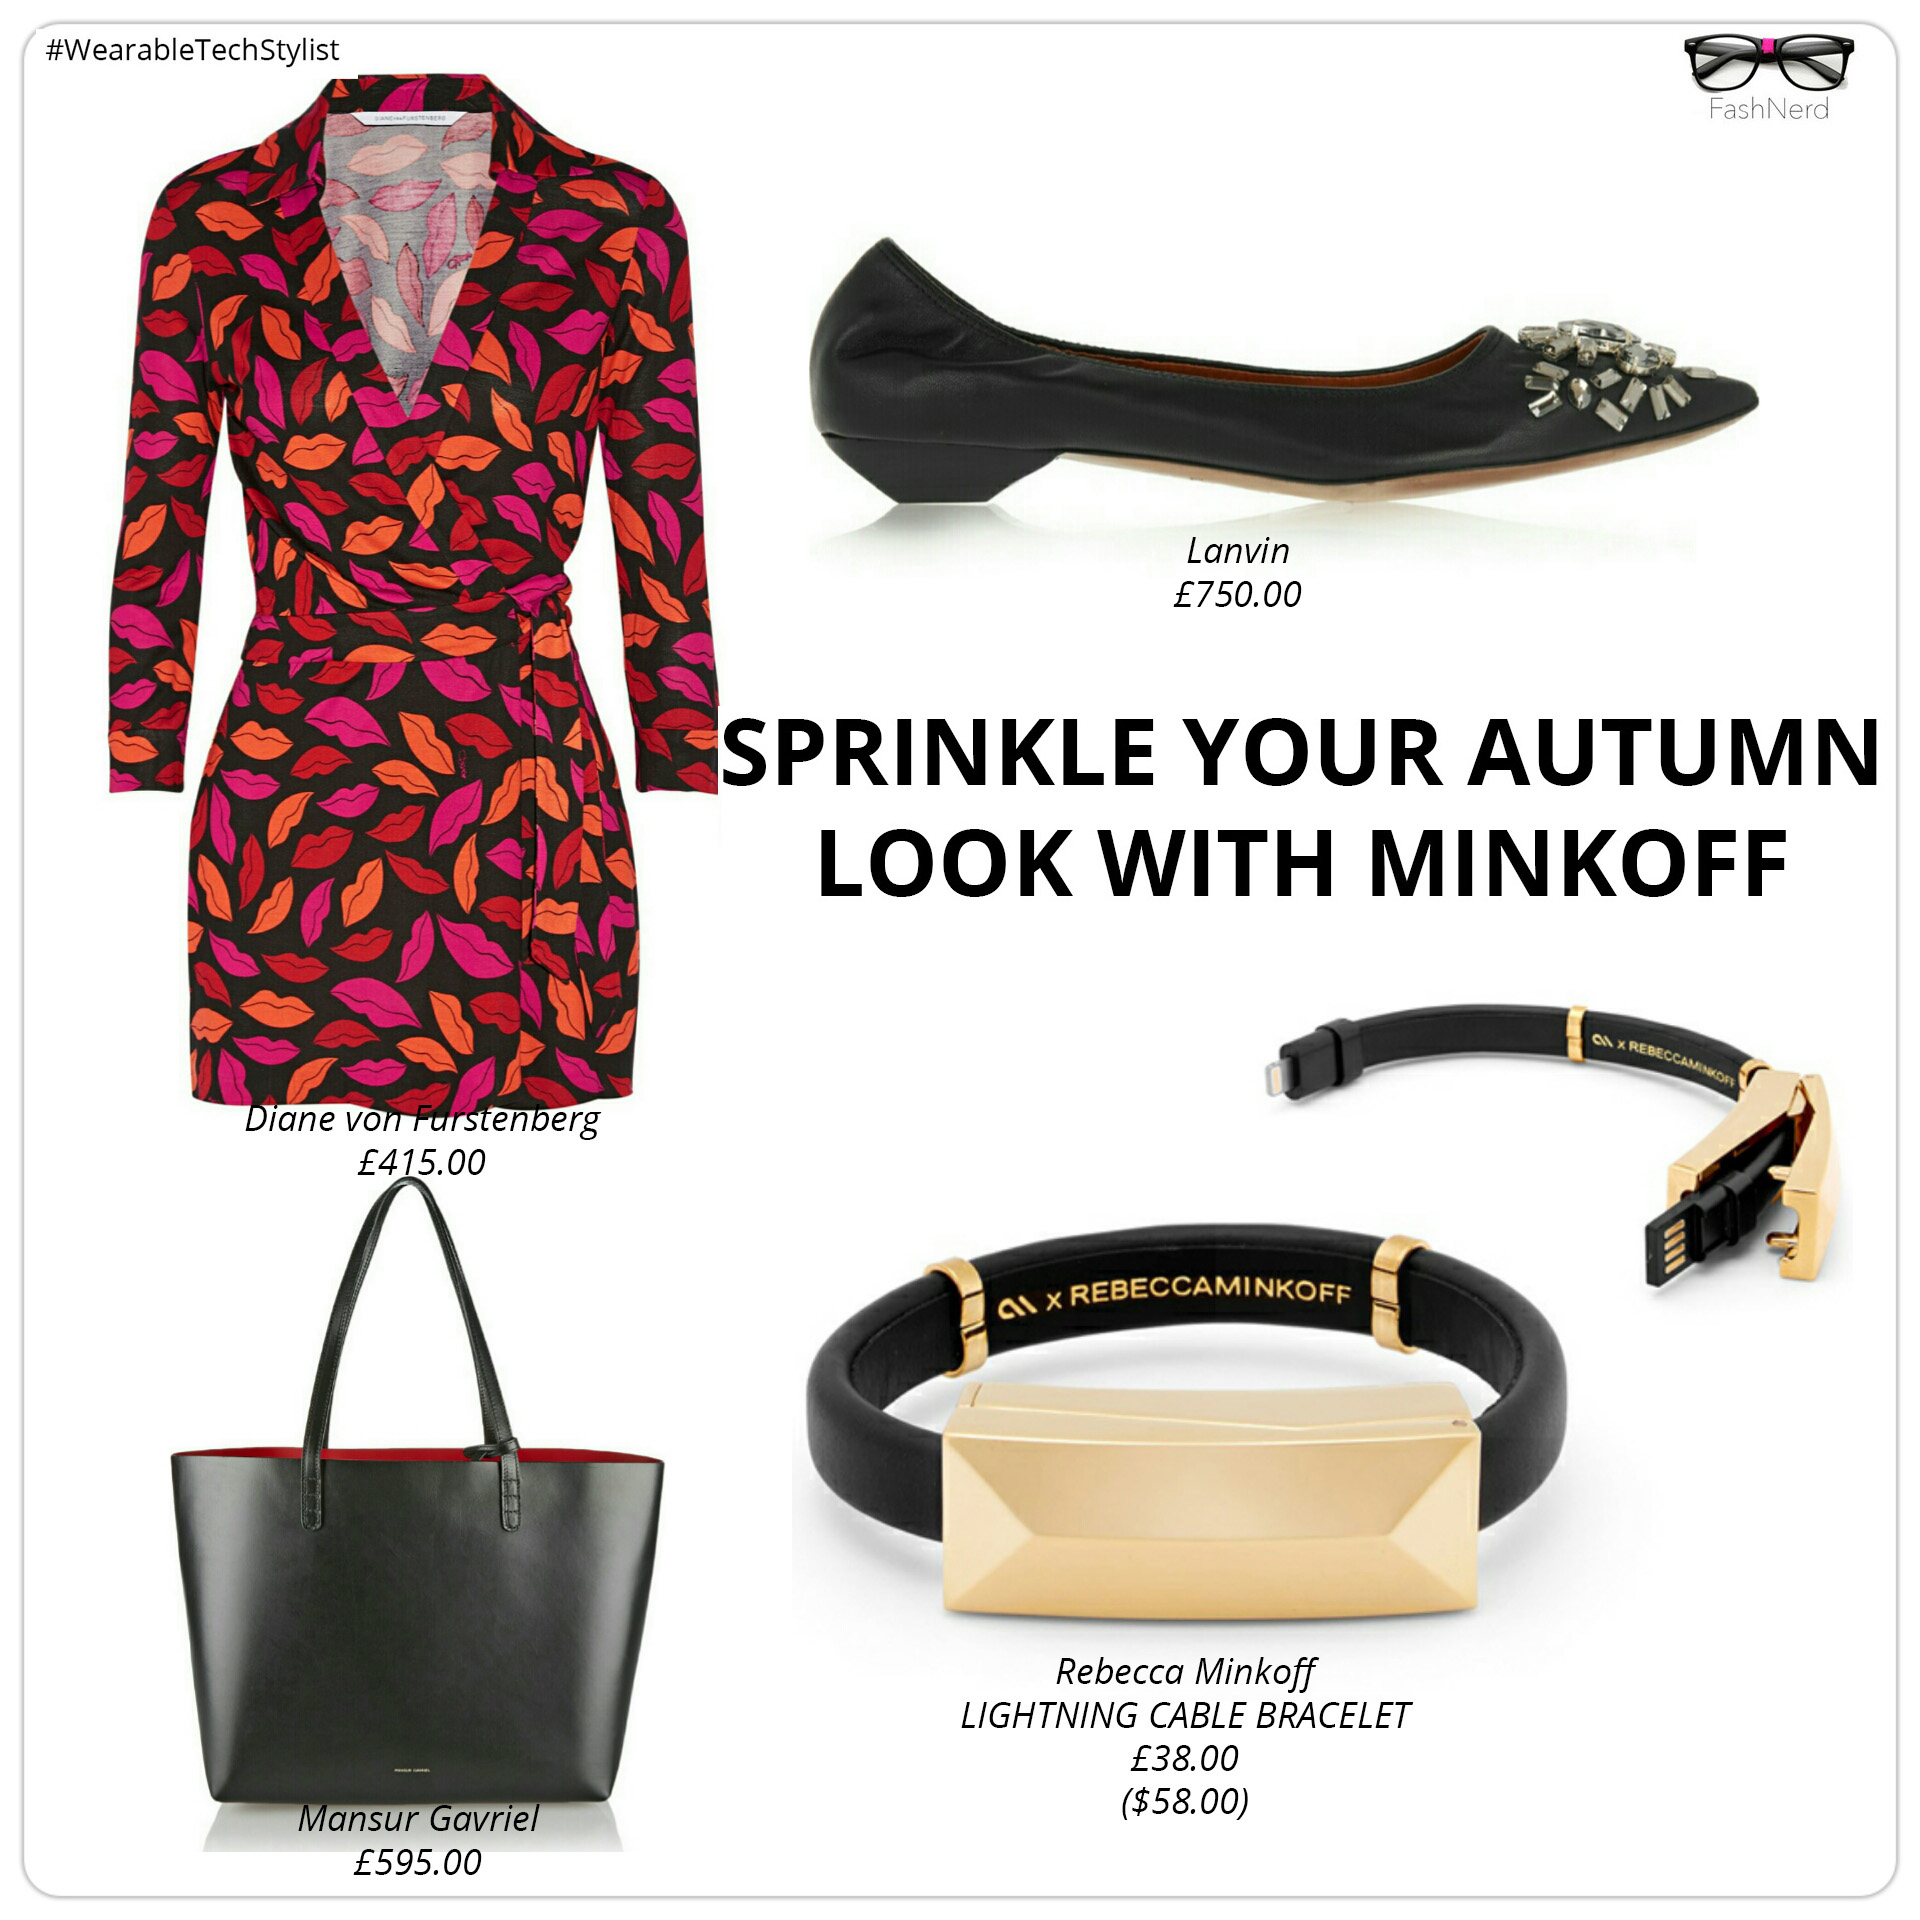 SPRINKLE YOUR AUTUMN LOOK WITH MINKOFF- FashNerd